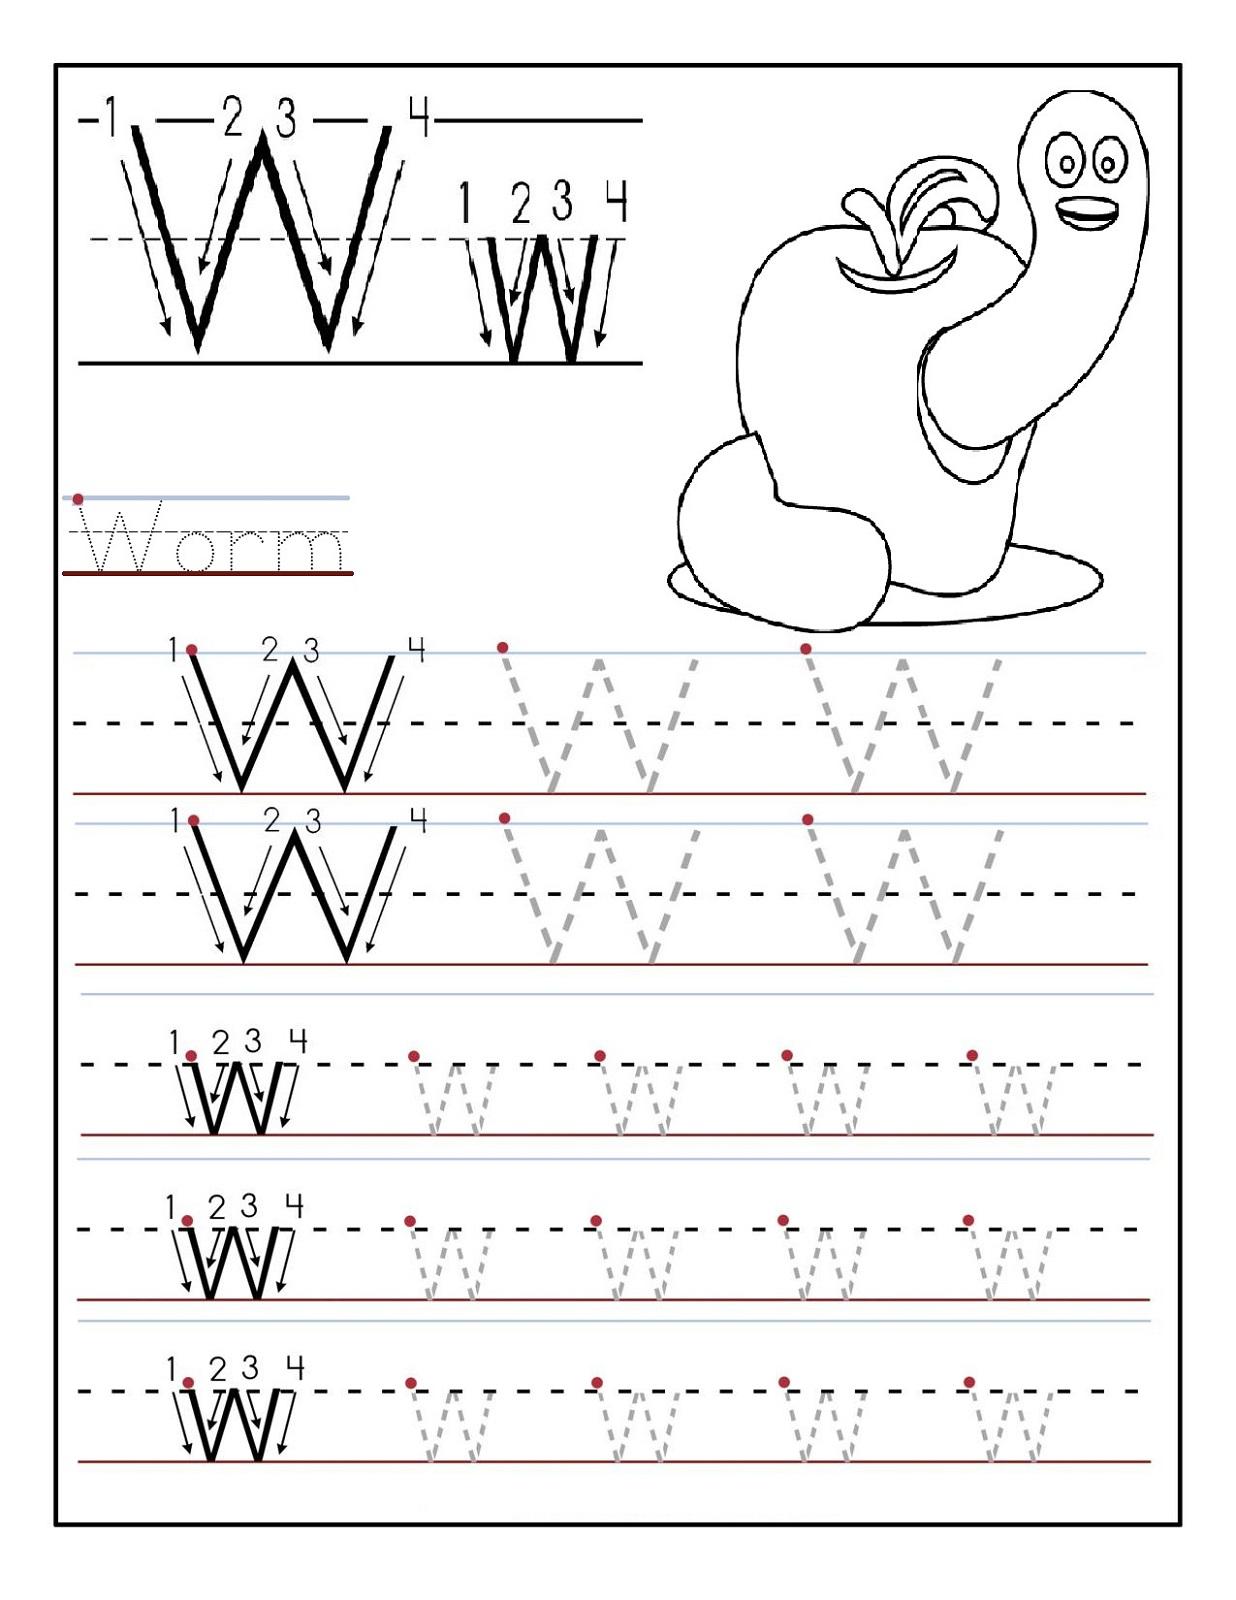 Traceable Alphabets for Children | Activity Shelter